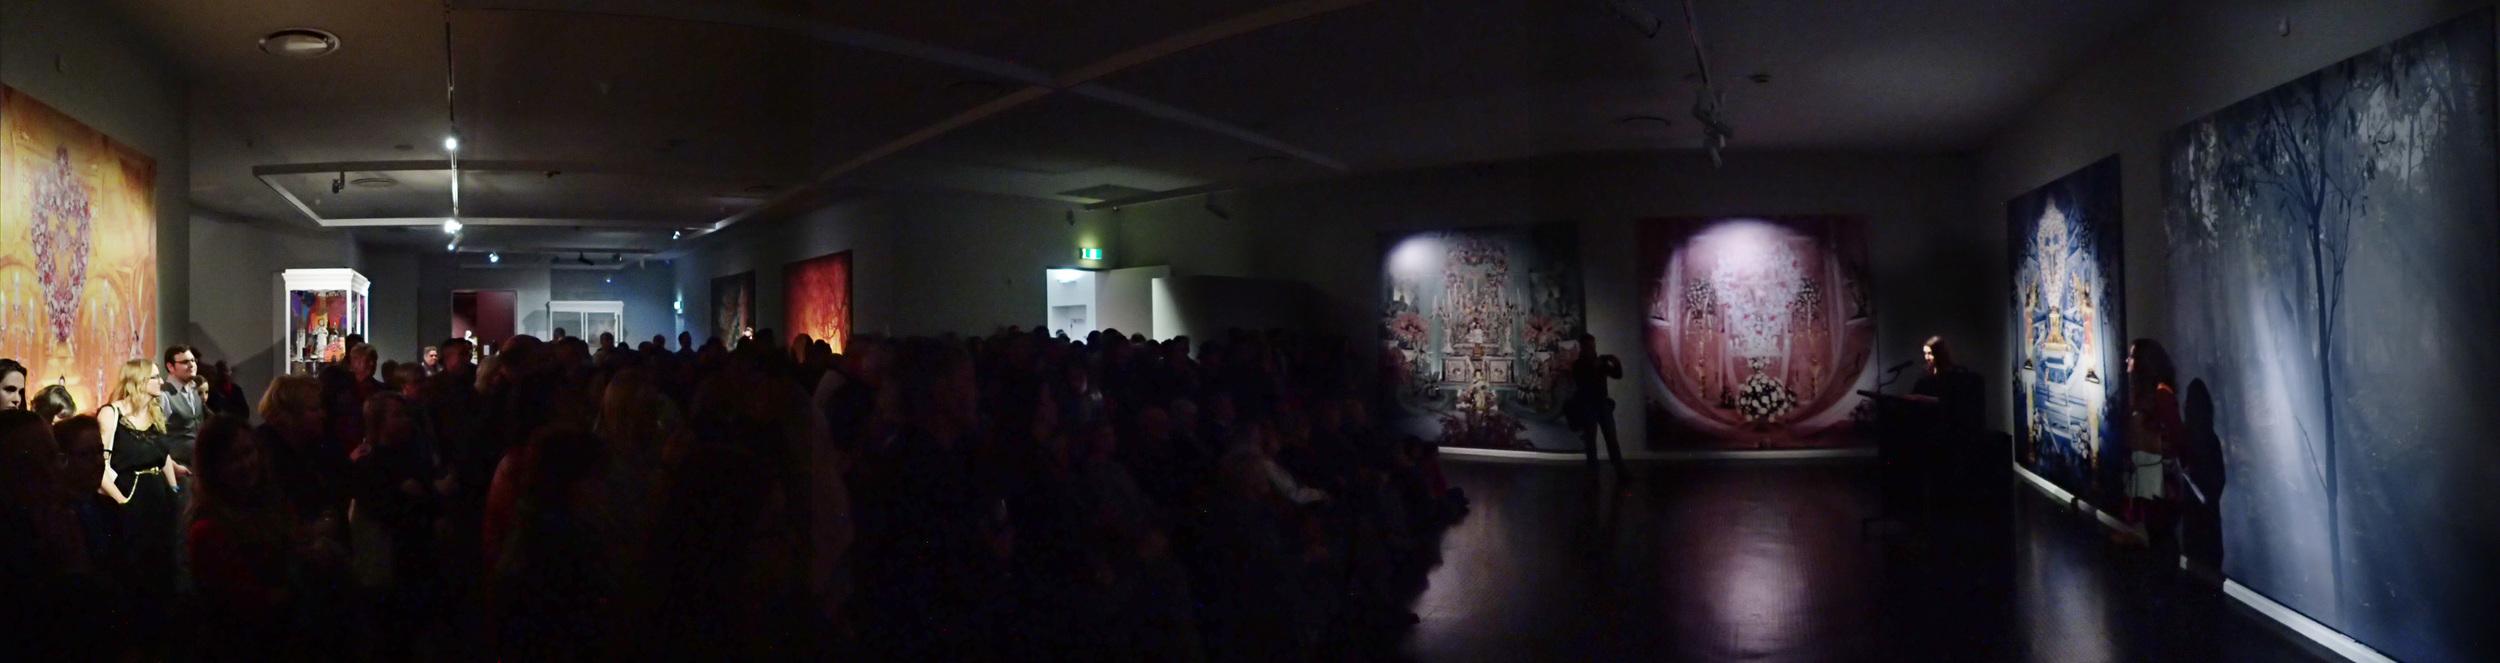 Culture Spirit Identity ; Warrnambool Art Gallery (opening night), Warrnambool/Australia 2016